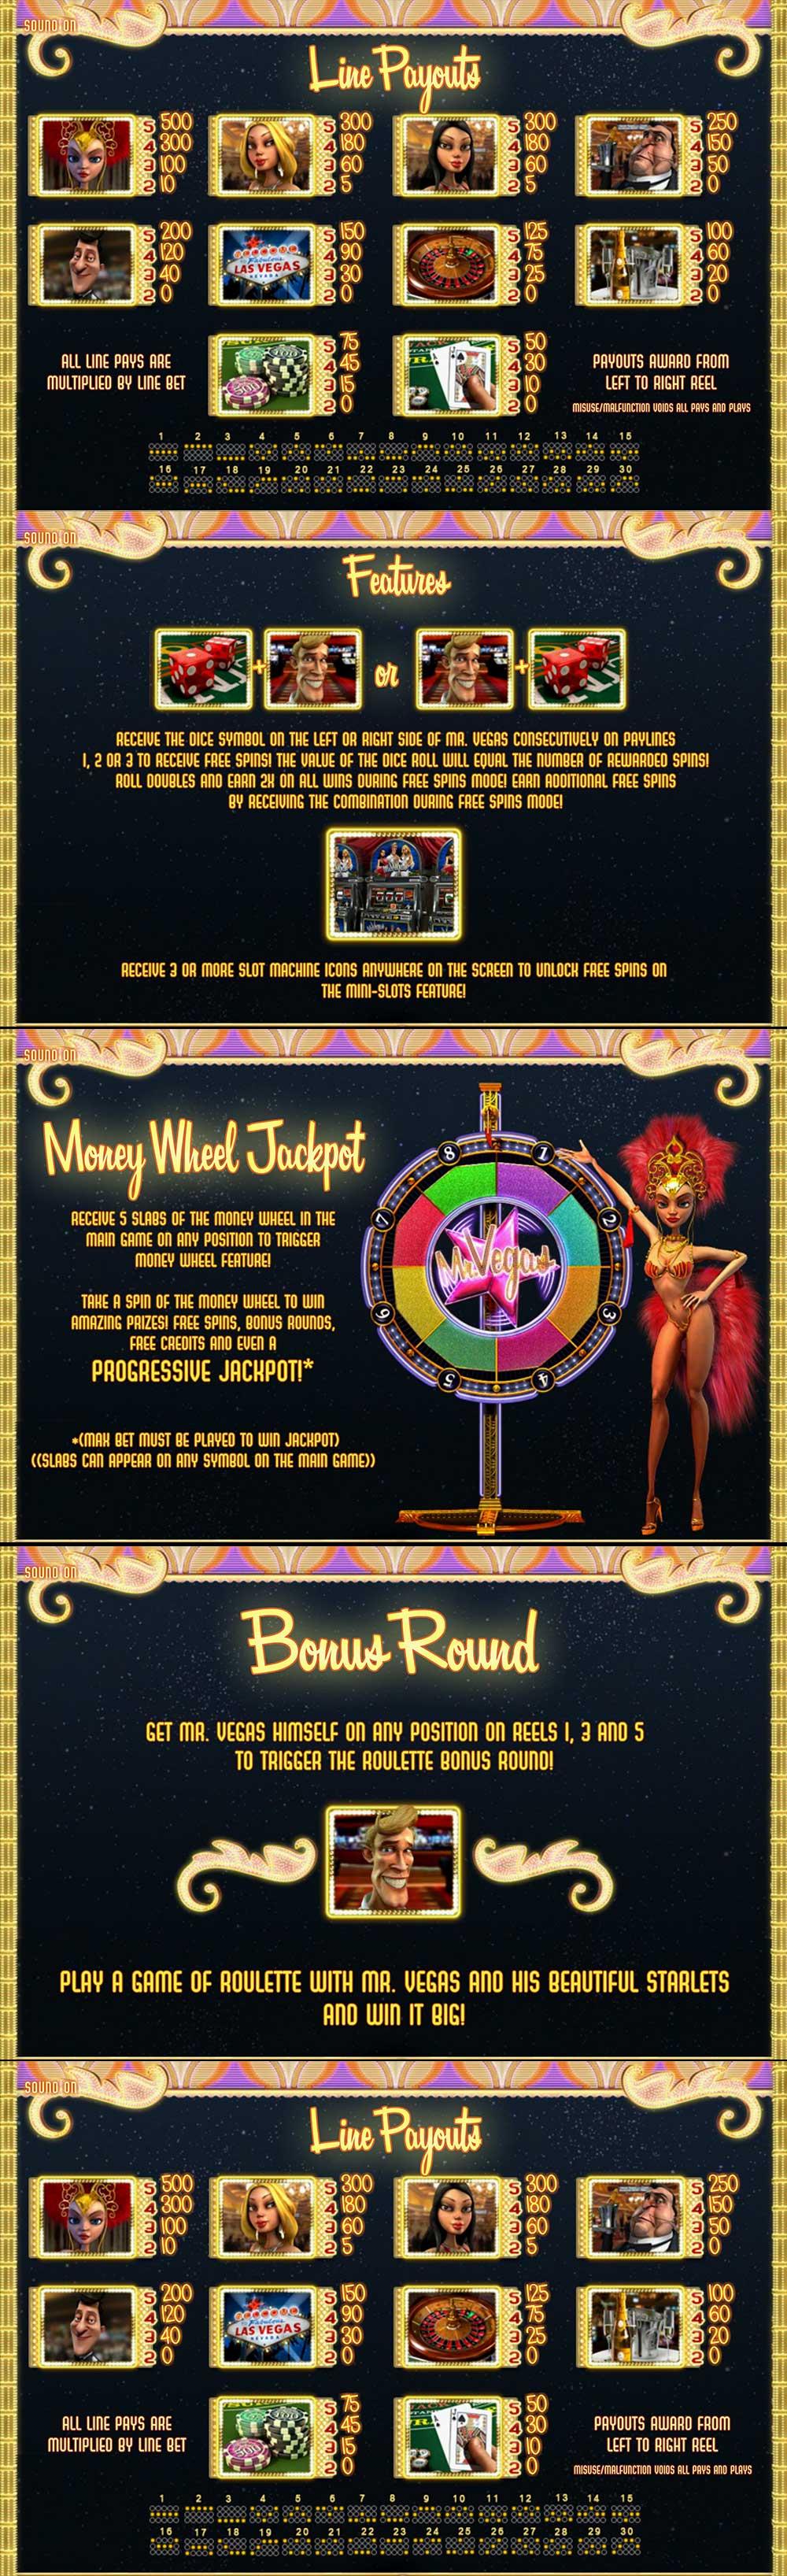 Mr. Vegas Pay Table Screenshot, Big Dollar Casino